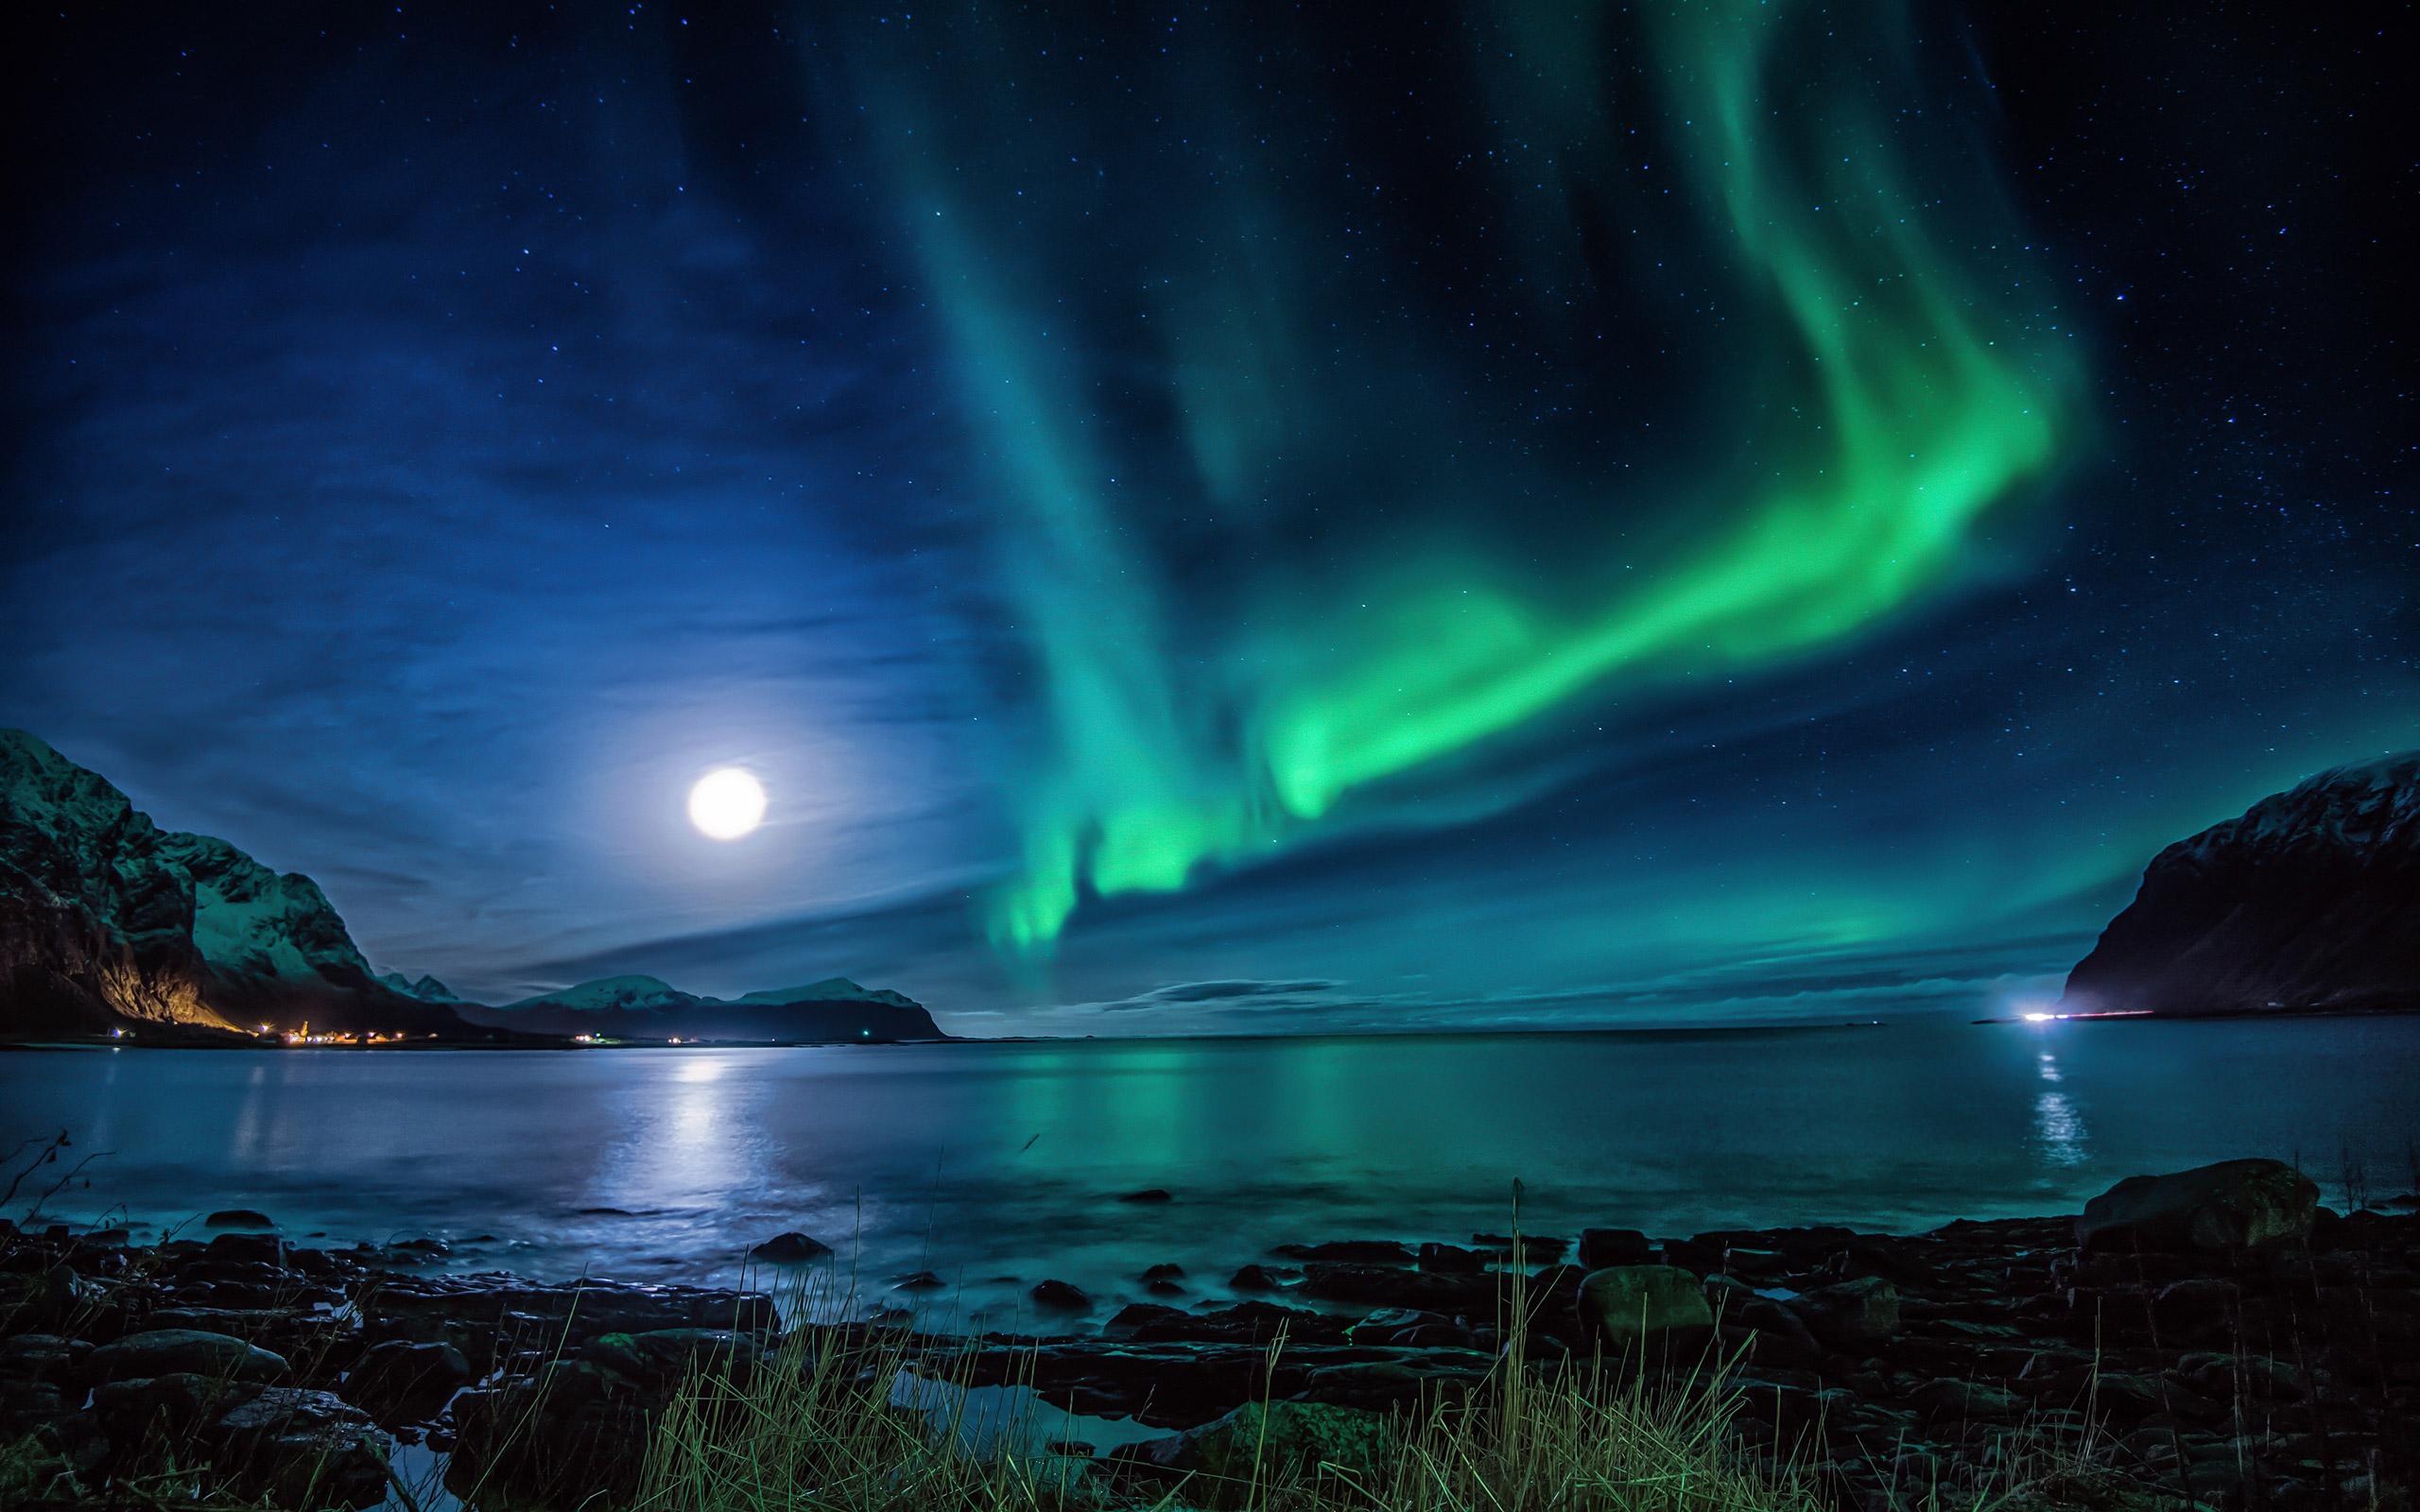 aurora borealis moon night hd nature 4k wallpapers